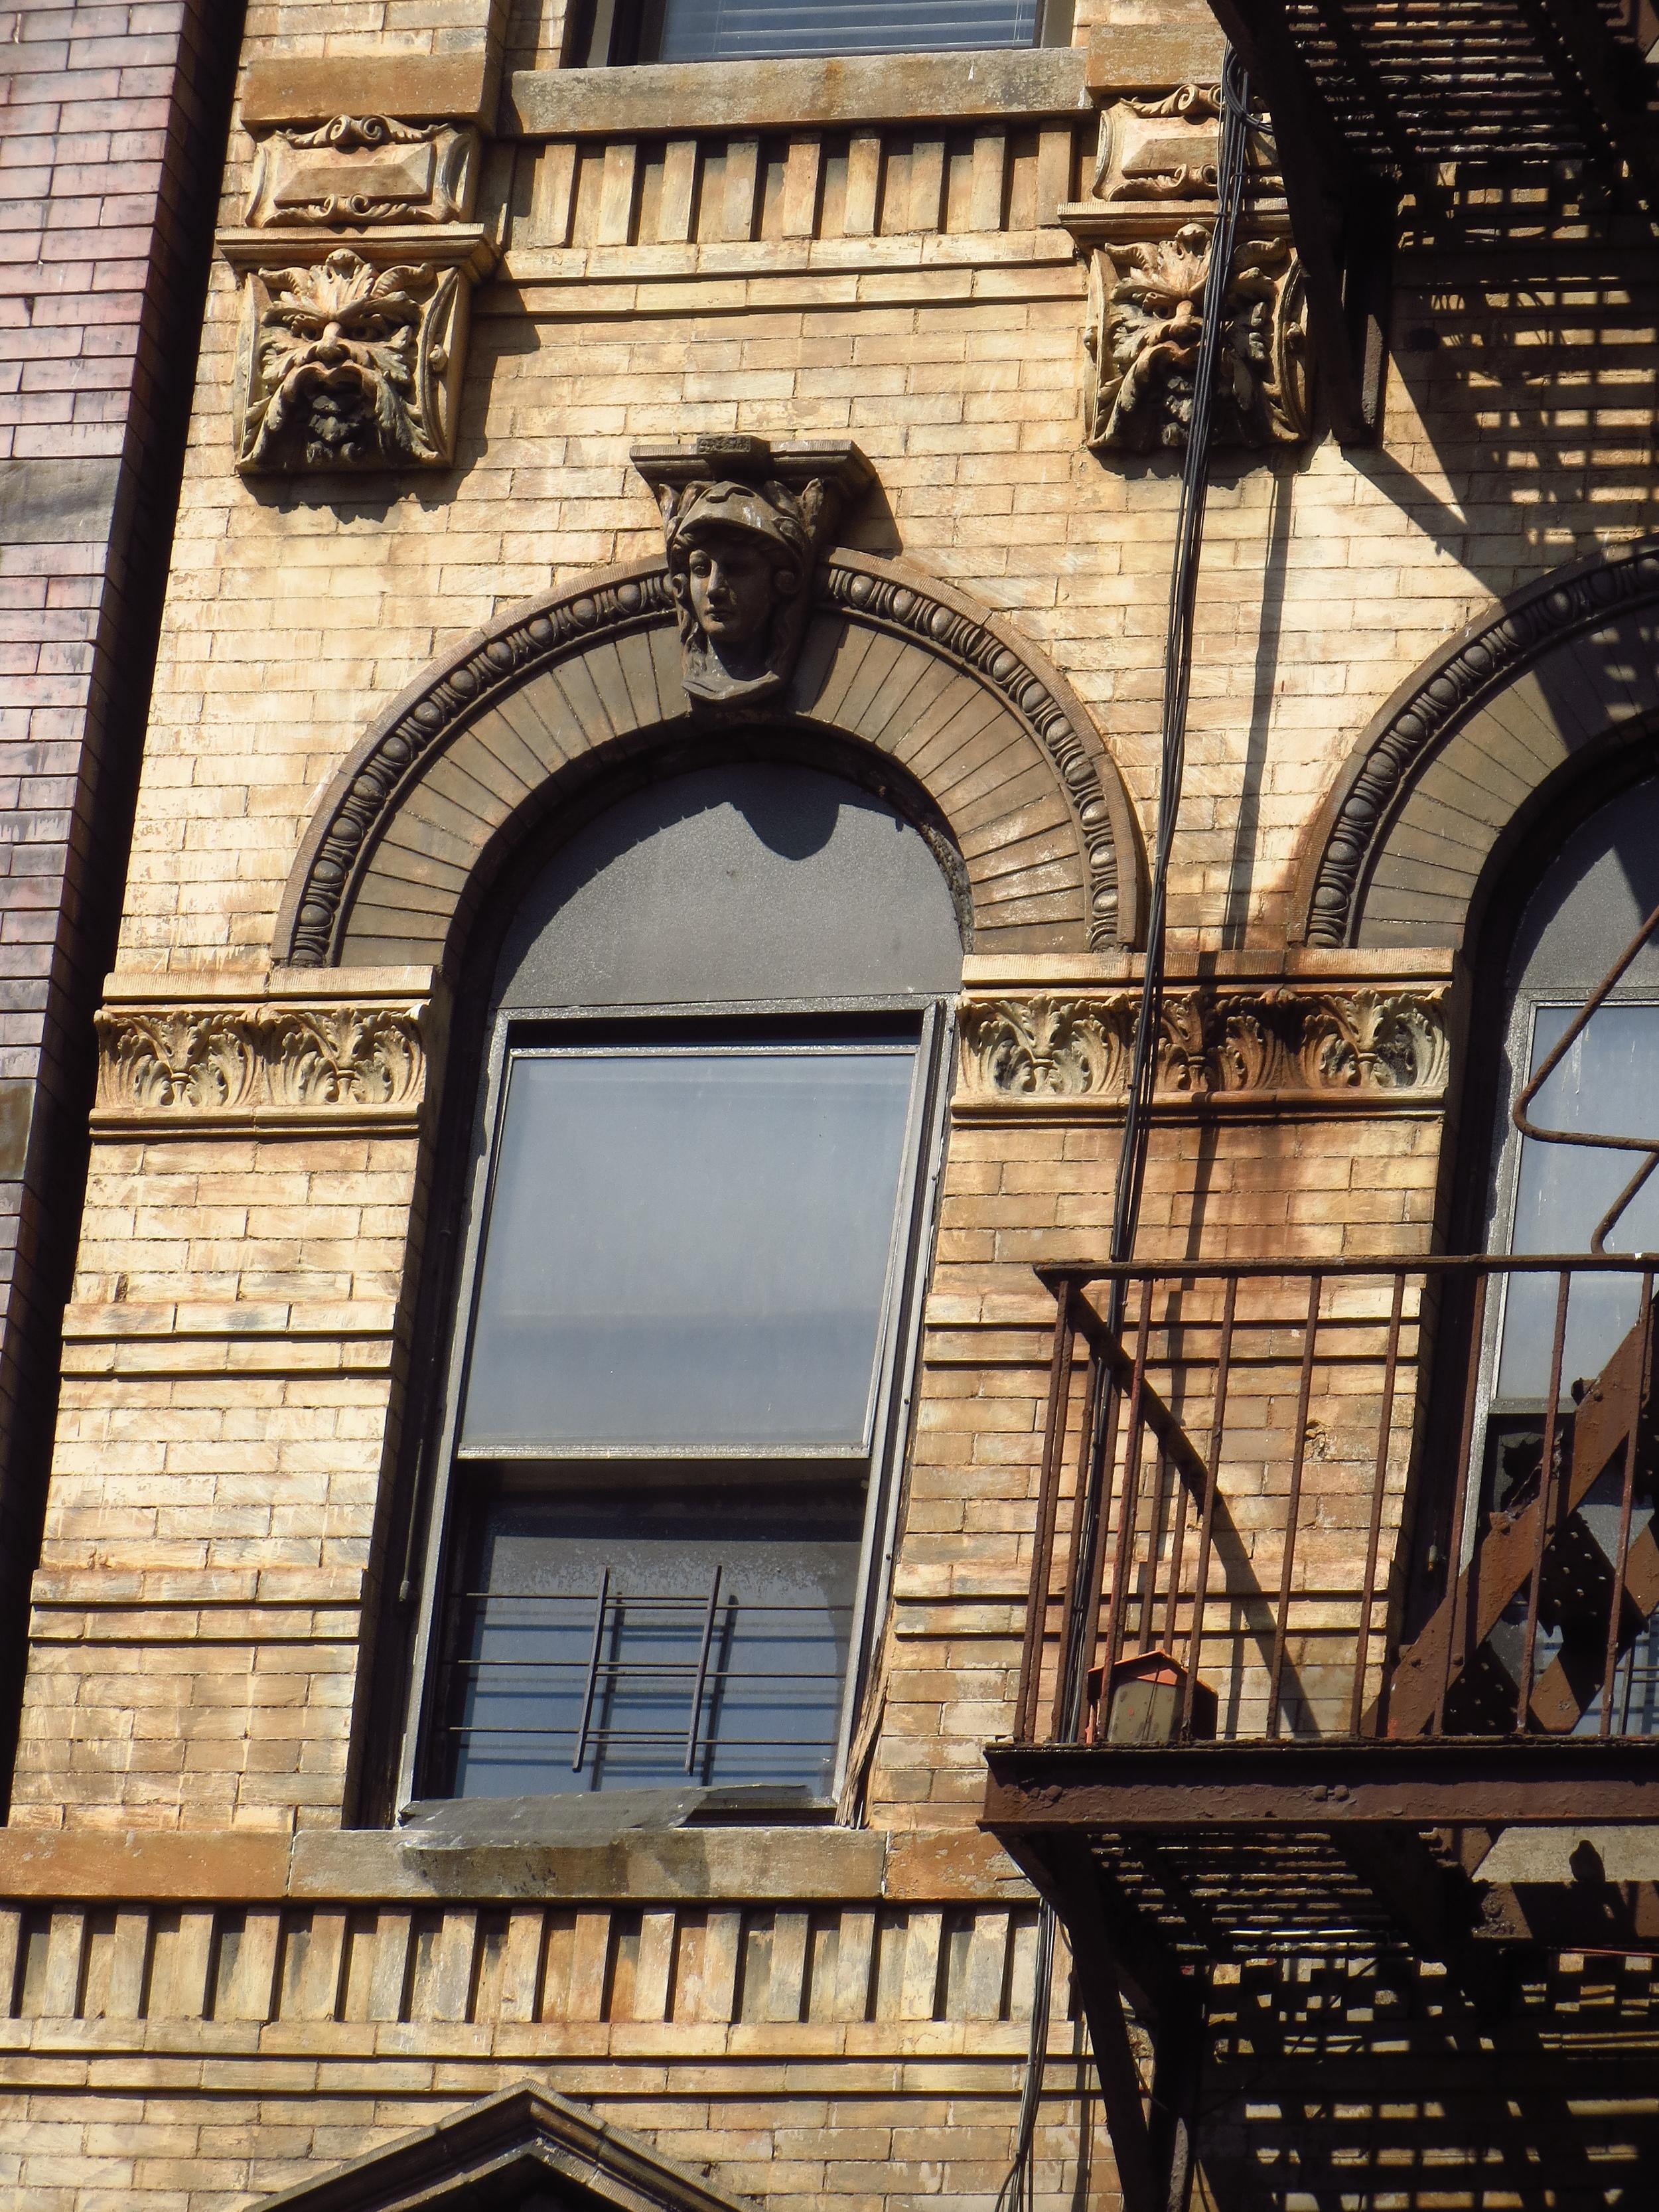 Cool window